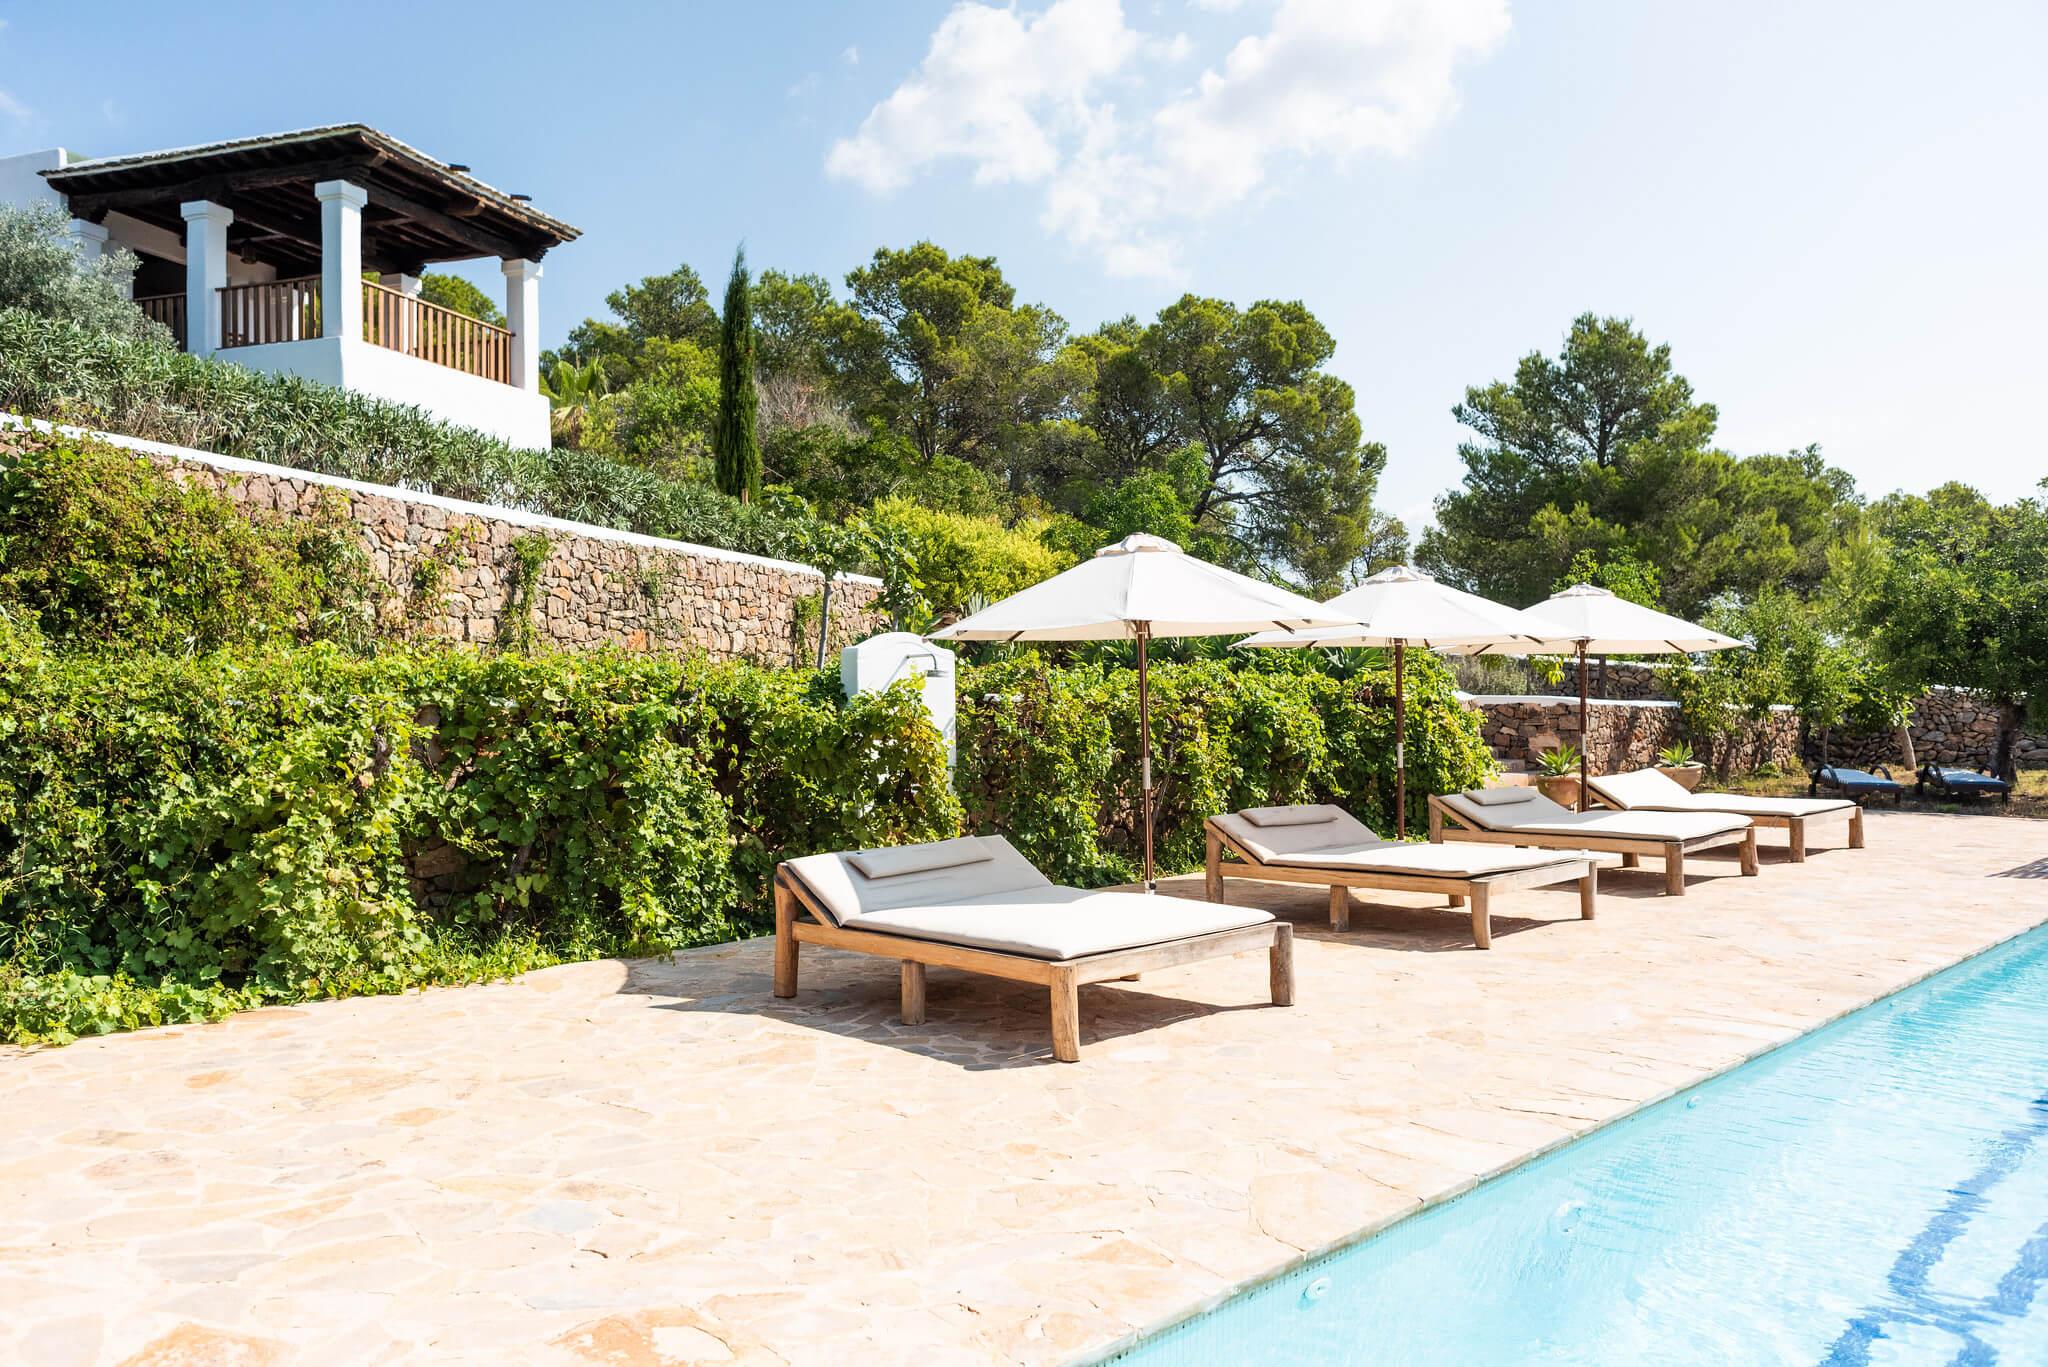 https://www.white-ibiza.com/wp-content/uploads/2020/05/white-ibiza-villas-can-lavanda-sun-loungers.jpg